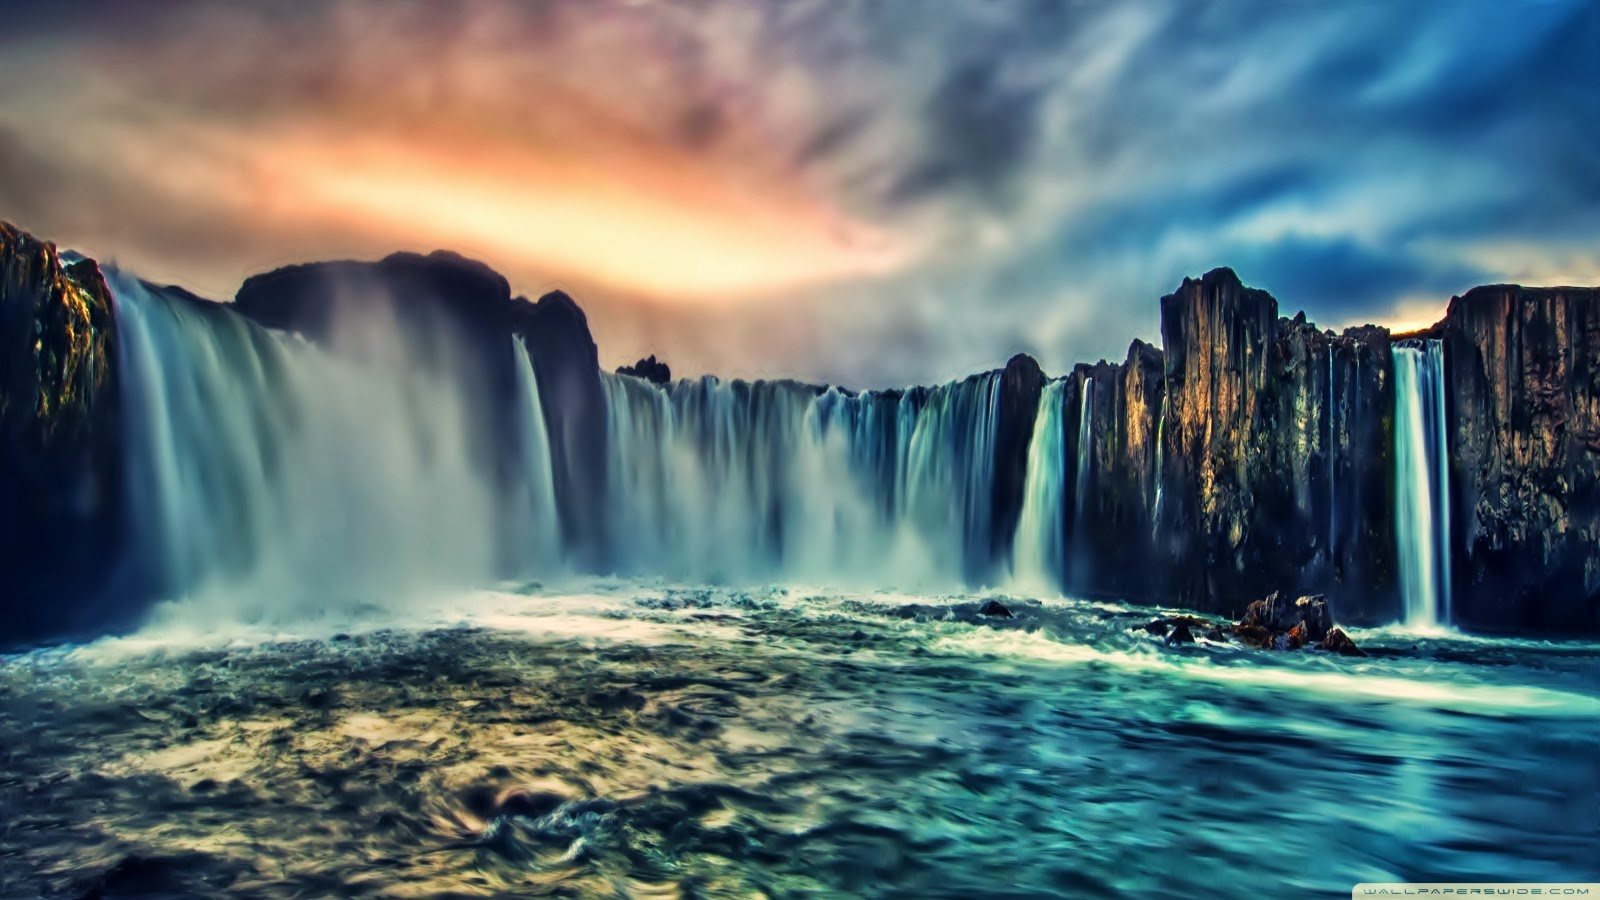 living waterfall wallpaper   wwwhigh definition wallpapercom 1600x900